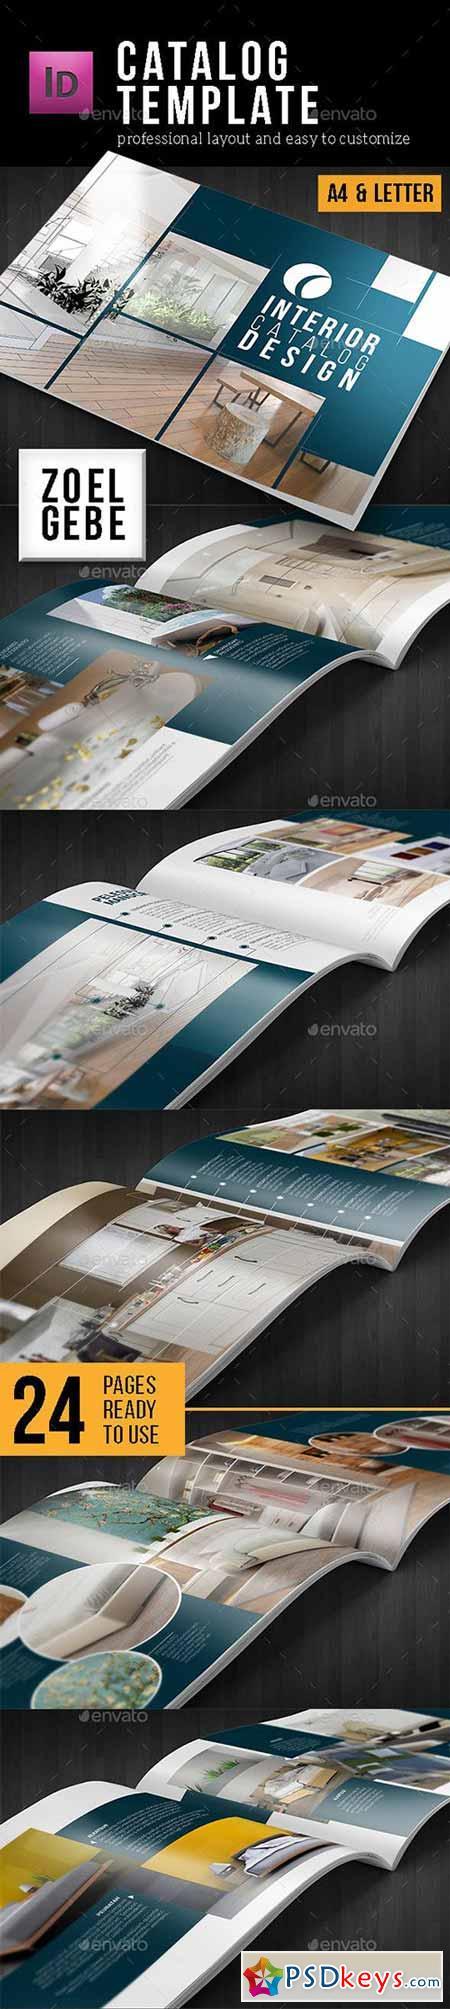 Multipurpose Catalog Template 16142496